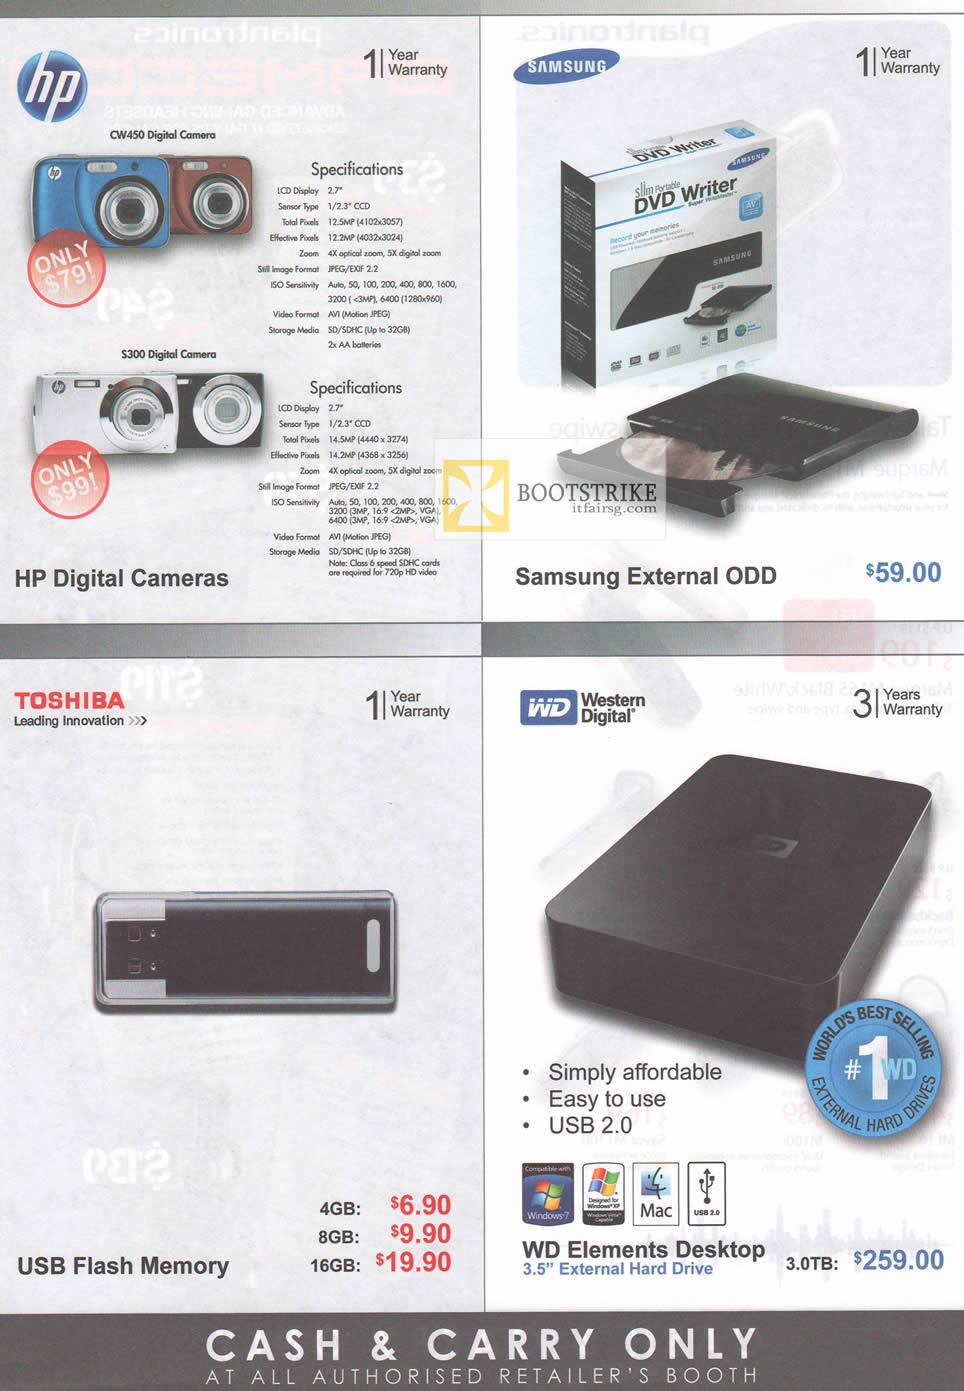 IT SHOW 2012 price list image brochure of Various HP CW450 Digital Camera, S300, Samsung External DVD Writer, Toshiba USB Flash Drive, WD Elements Desktop External Storage